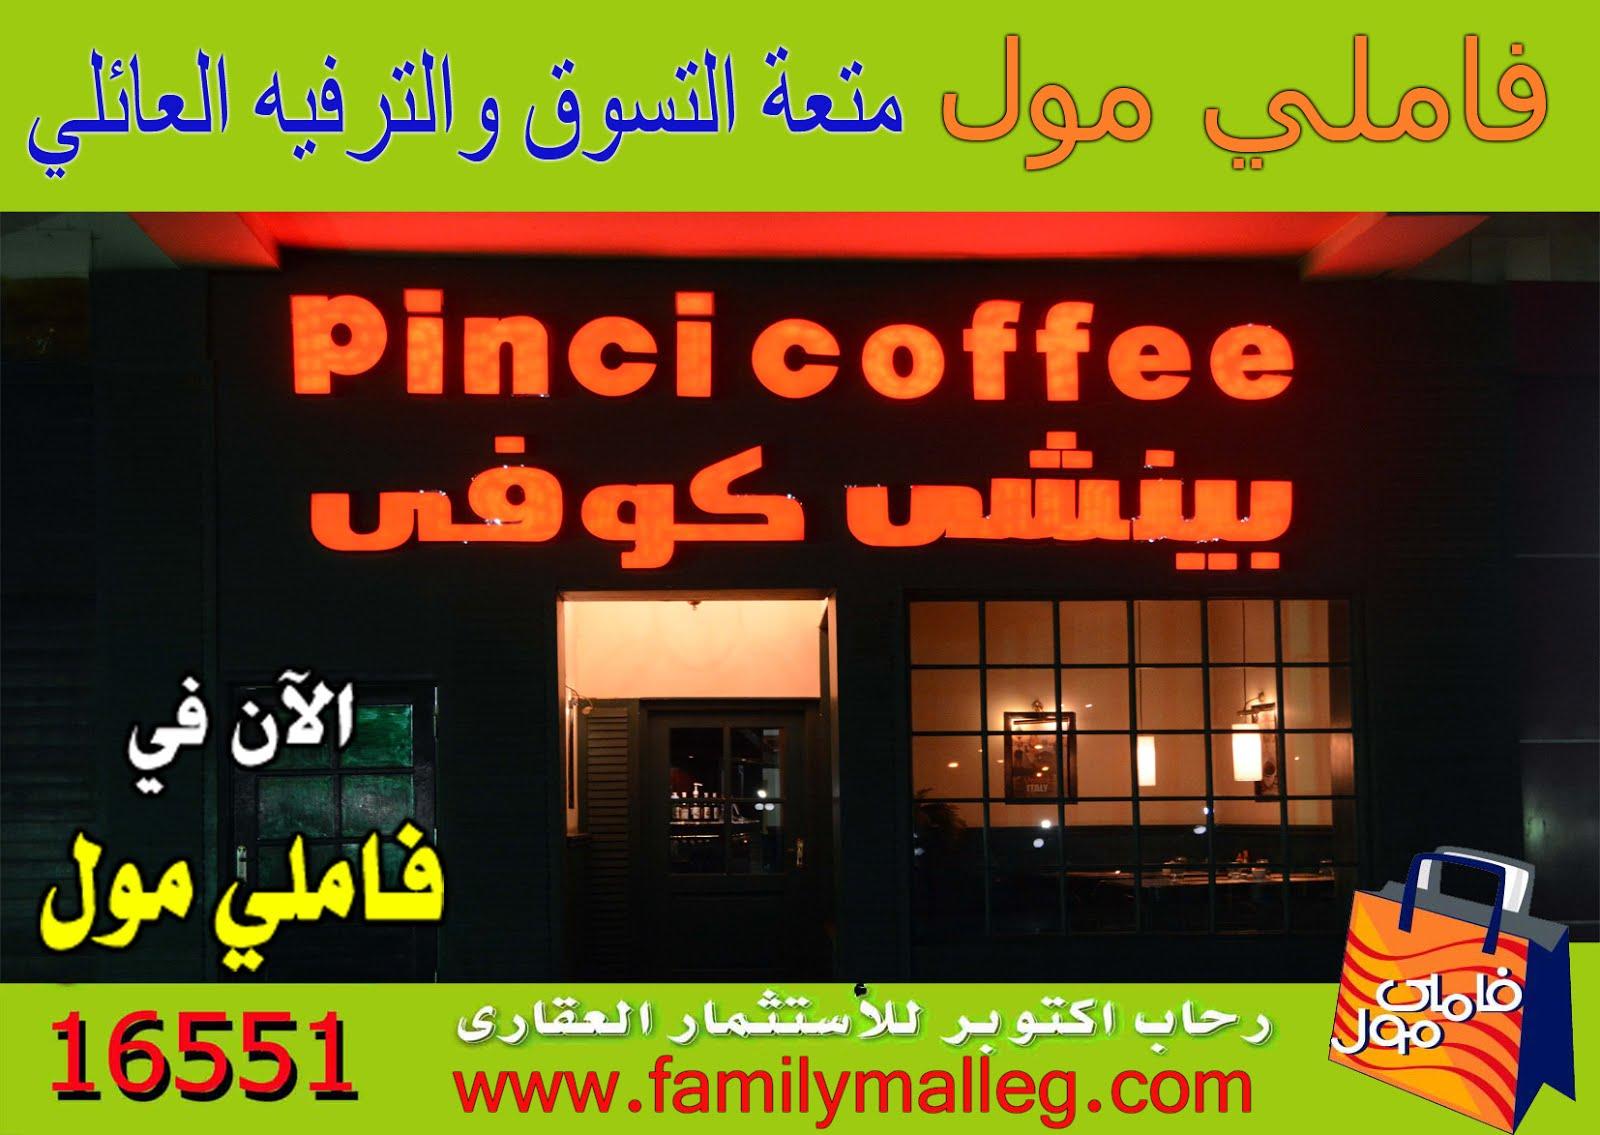 كافيه بينشي  Pinci cafe   ومطاعم سبيكترا Spectra Restaurants